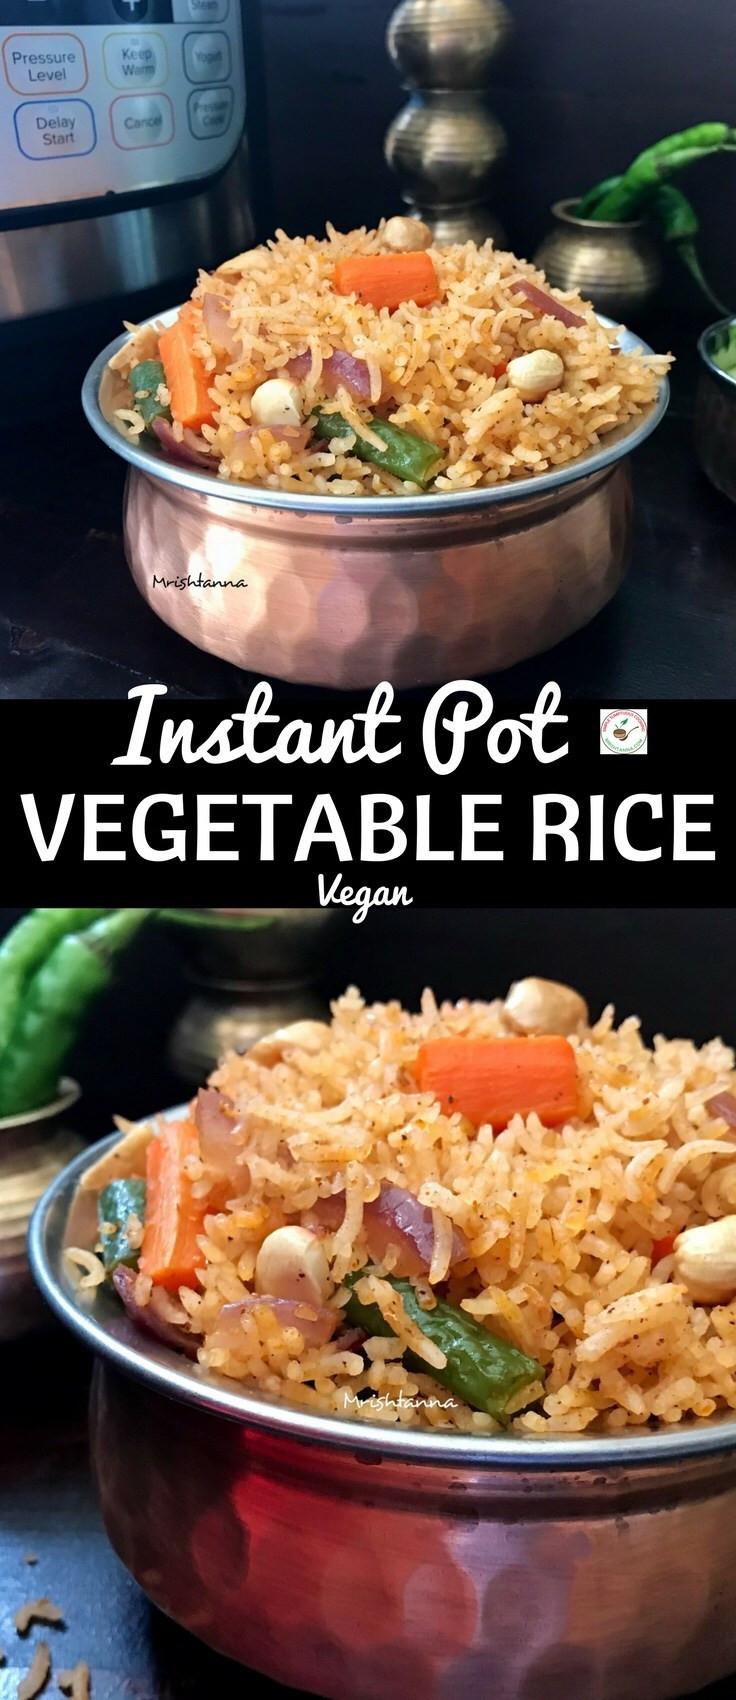 Instant Pot Recipes Vegetarian  Instant Pot Ve able Rice Simple Sumptuous Cooking